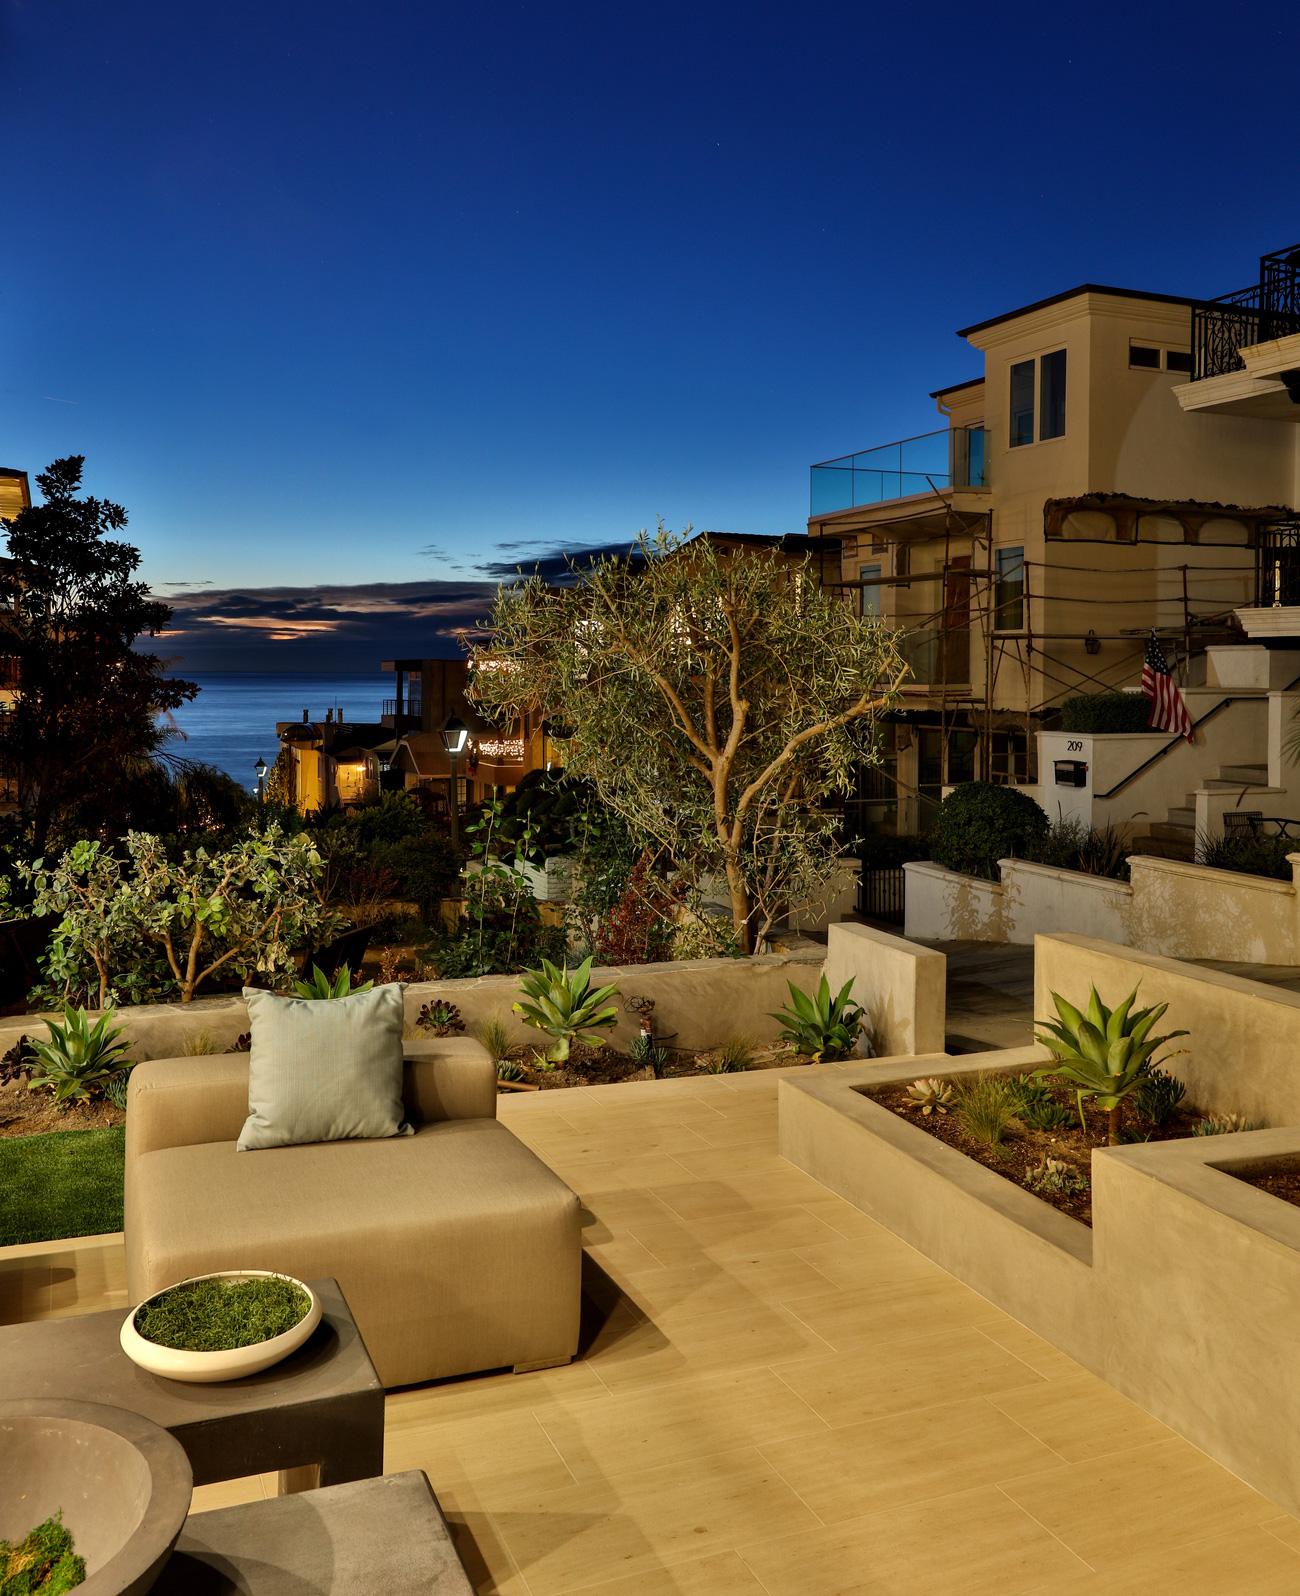 ocean-view-patio-silicon-bay.jpg